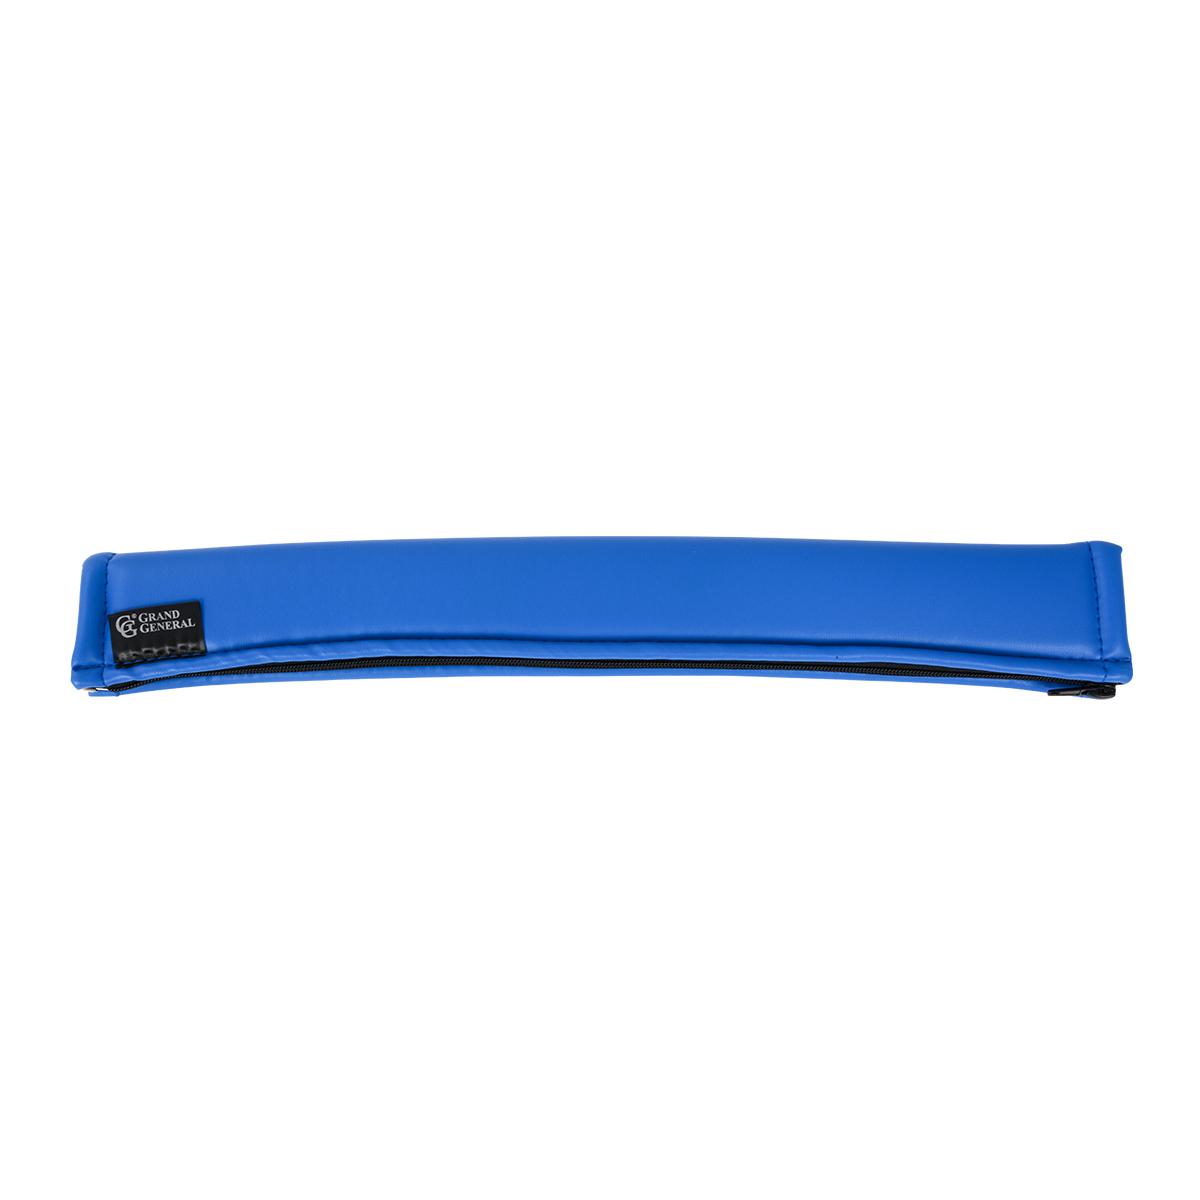 "17"" Matte Blue Gear Shift Stick Cover for Peterbilt Kenworth Freightliner"